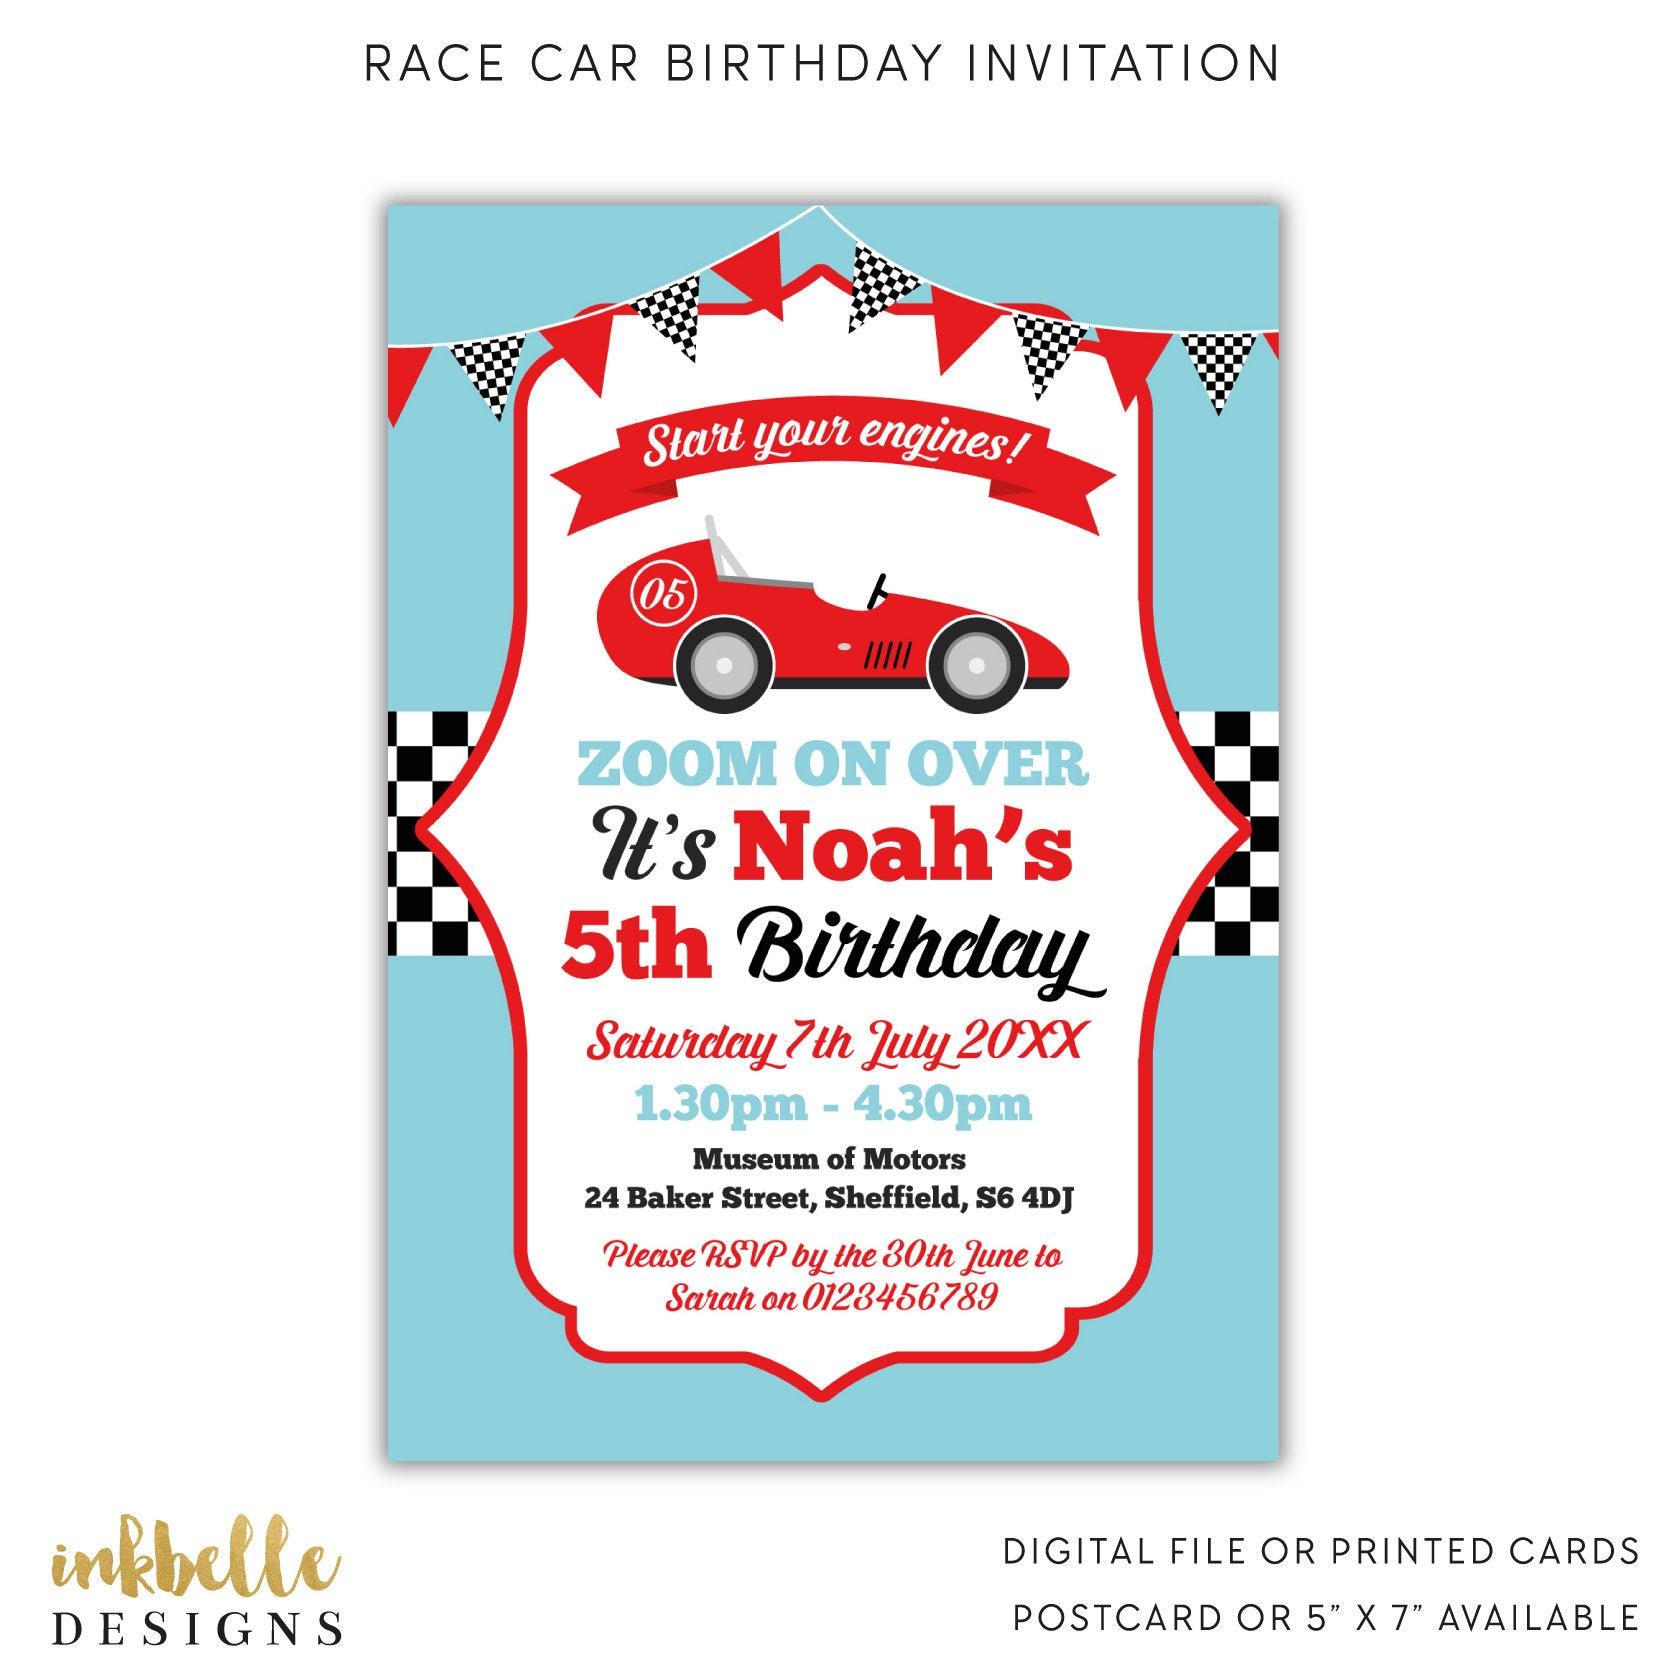 Race Car Birthday Invitation Printed Card Digital File PDF | Etsy